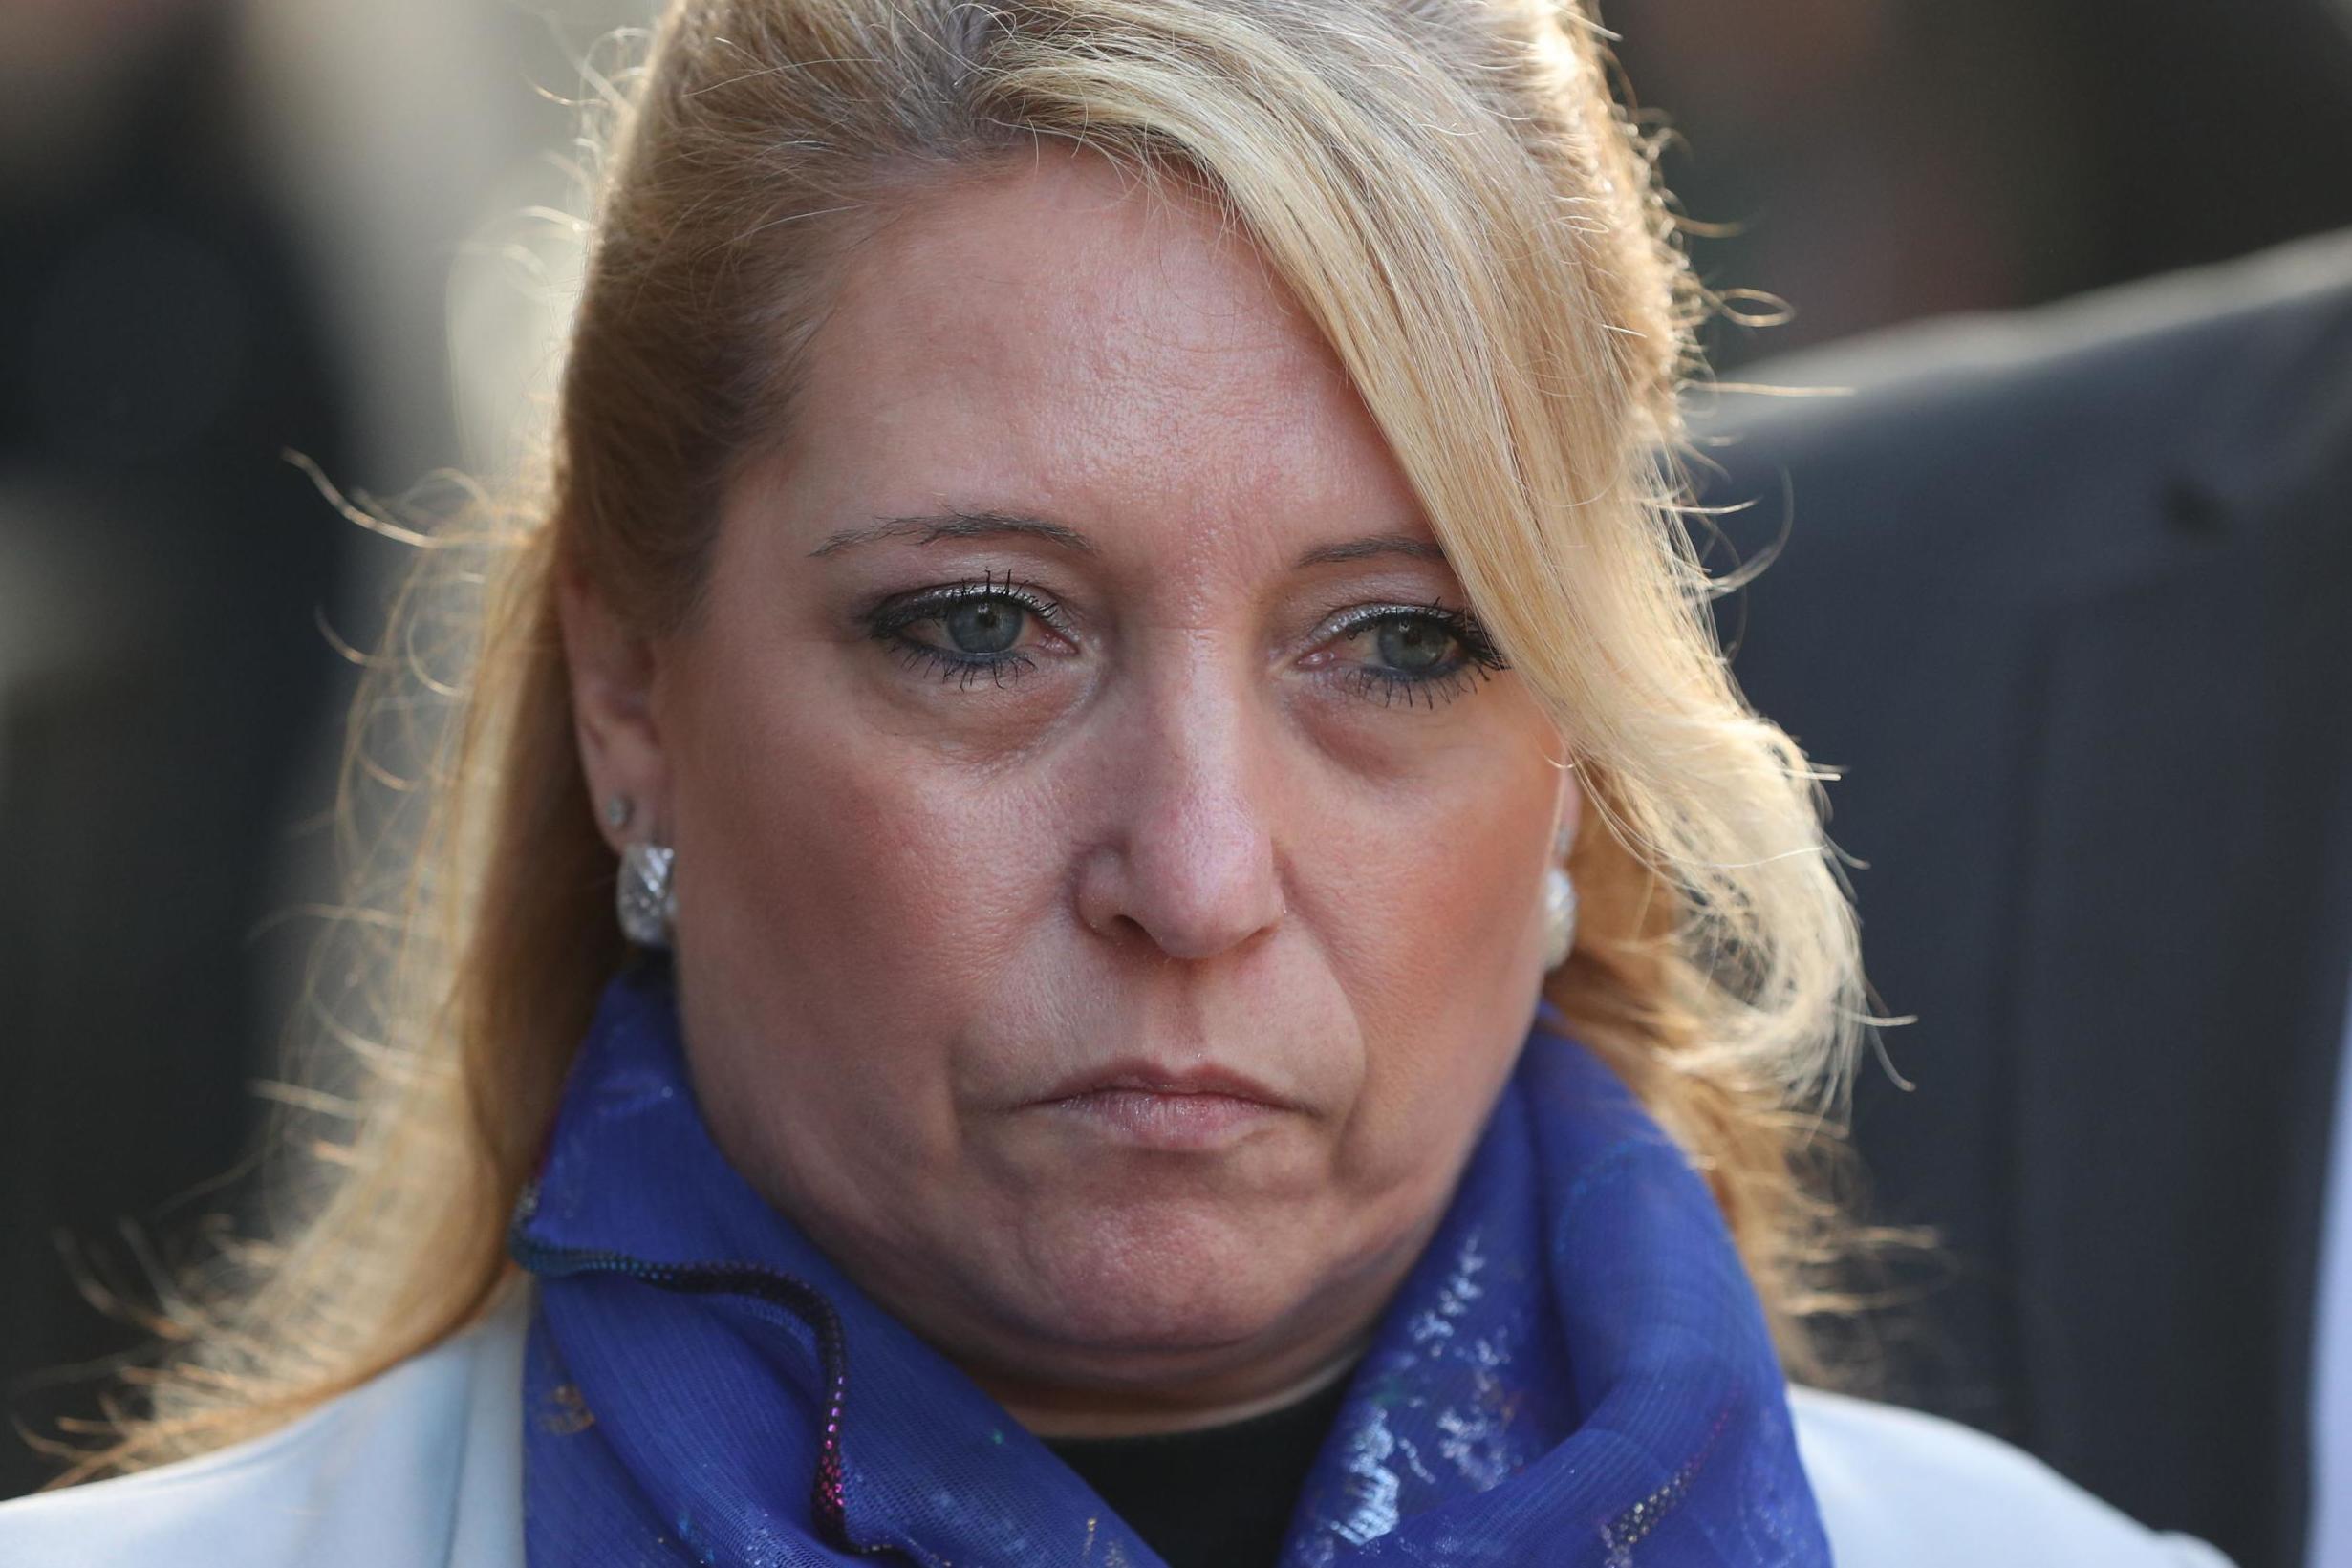 Detainment, la madre di James Bulger Denise Fergus